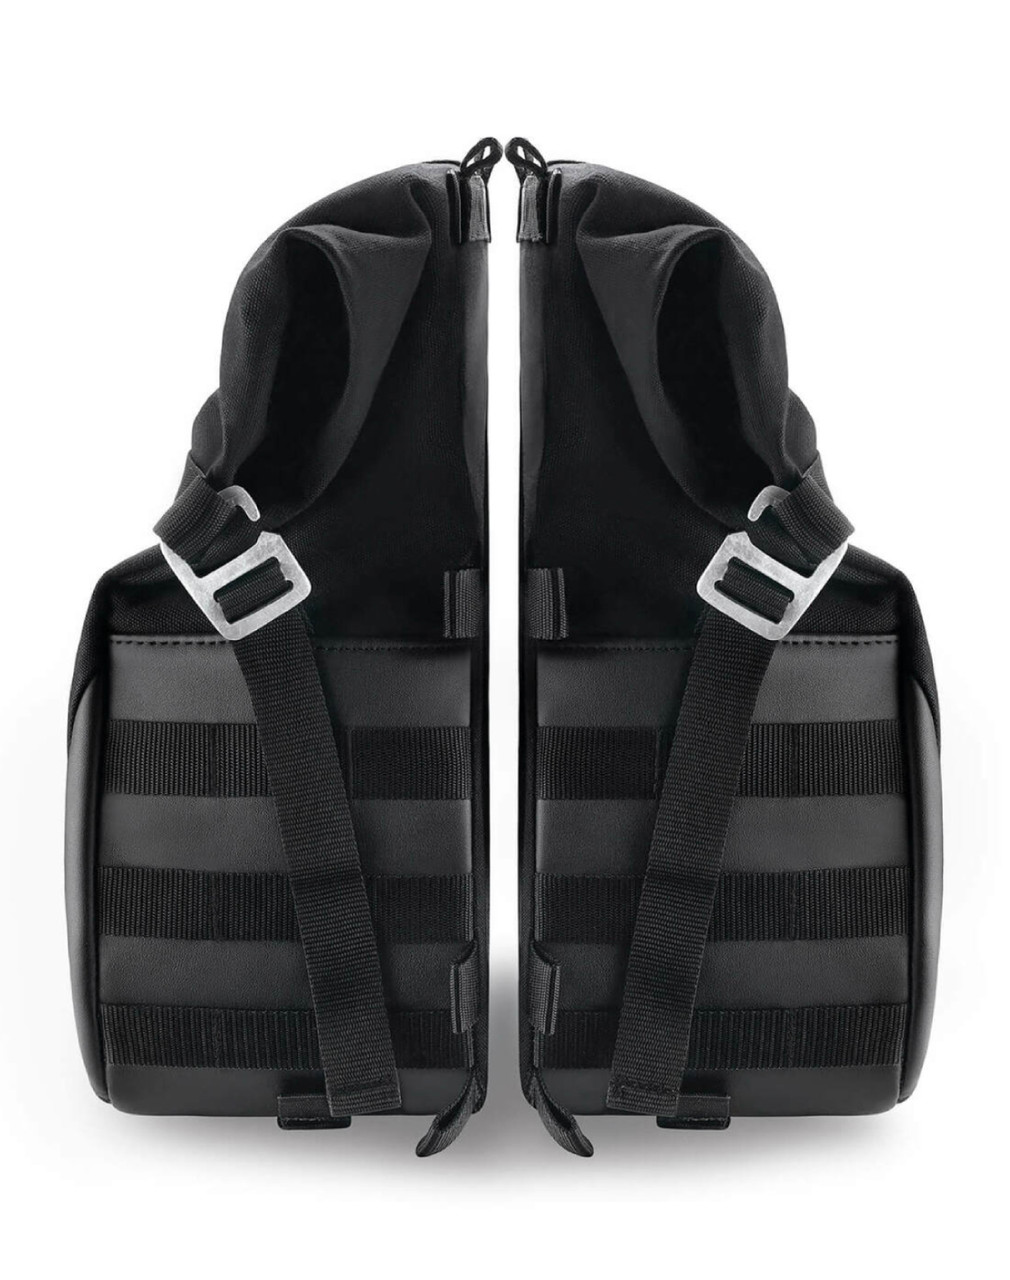 Viking Bonafide Large Black Motorcycle Triumph Bonneville T120 Saddlebags Both Bags View